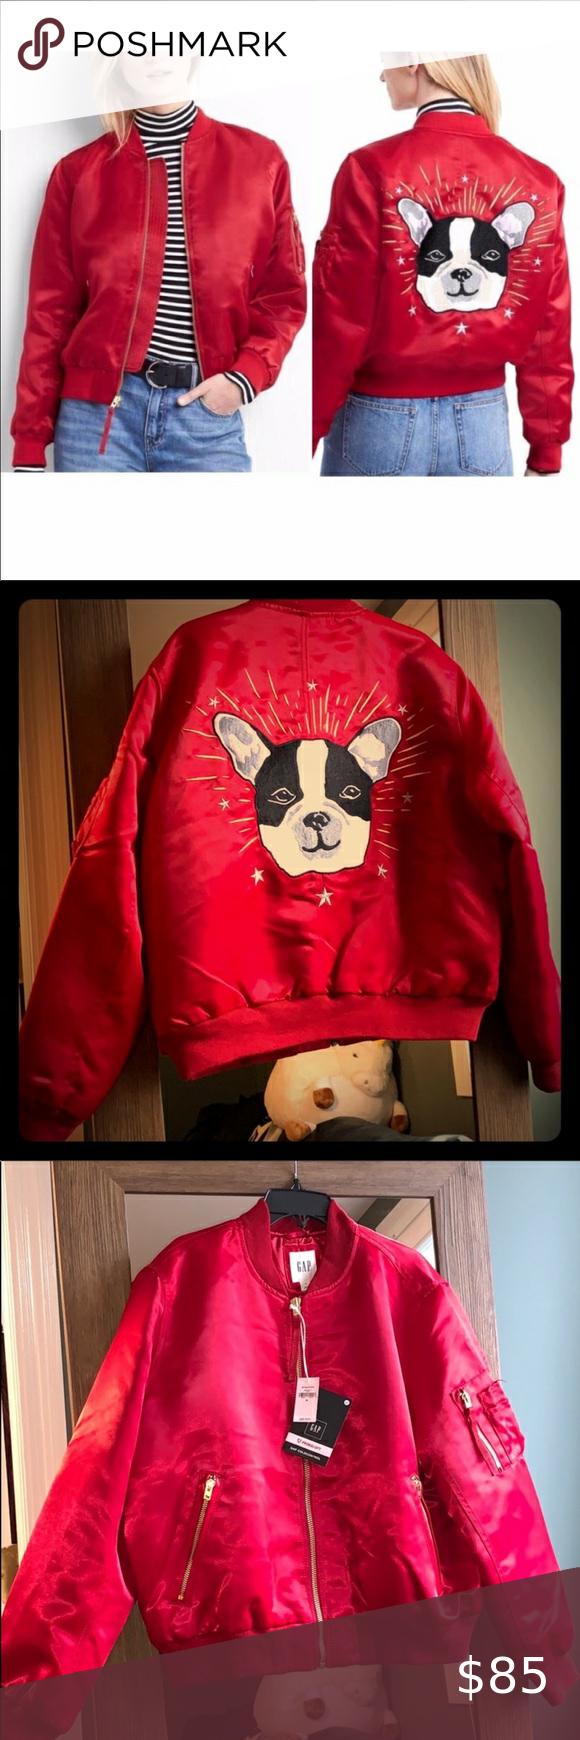 Gap French Bulldog Dog Red Satin Bomber Jacket Nwt Gap French Bulldog Dog Red Satin Bomber Jacket Nwt New Wi Satin Bomber Jacket Clothes Design Fashion Design [ 1740 x 580 Pixel ]